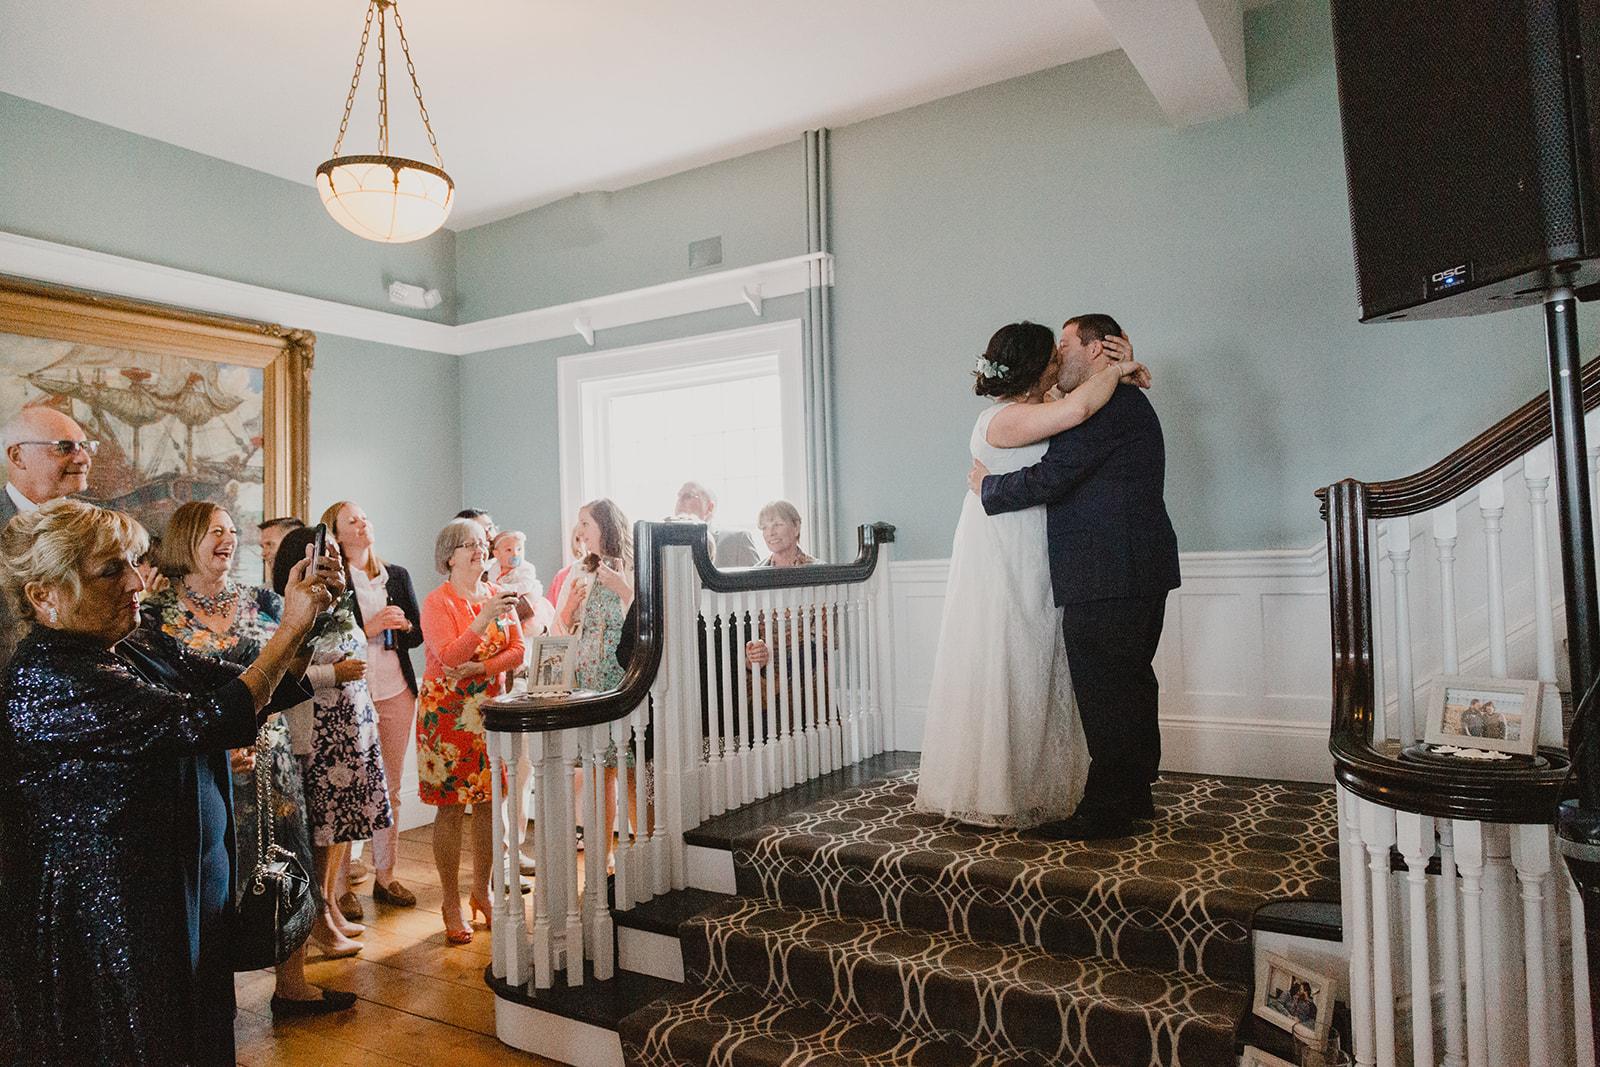 Macdonald_Wedding_ADP_2019-647.jpg